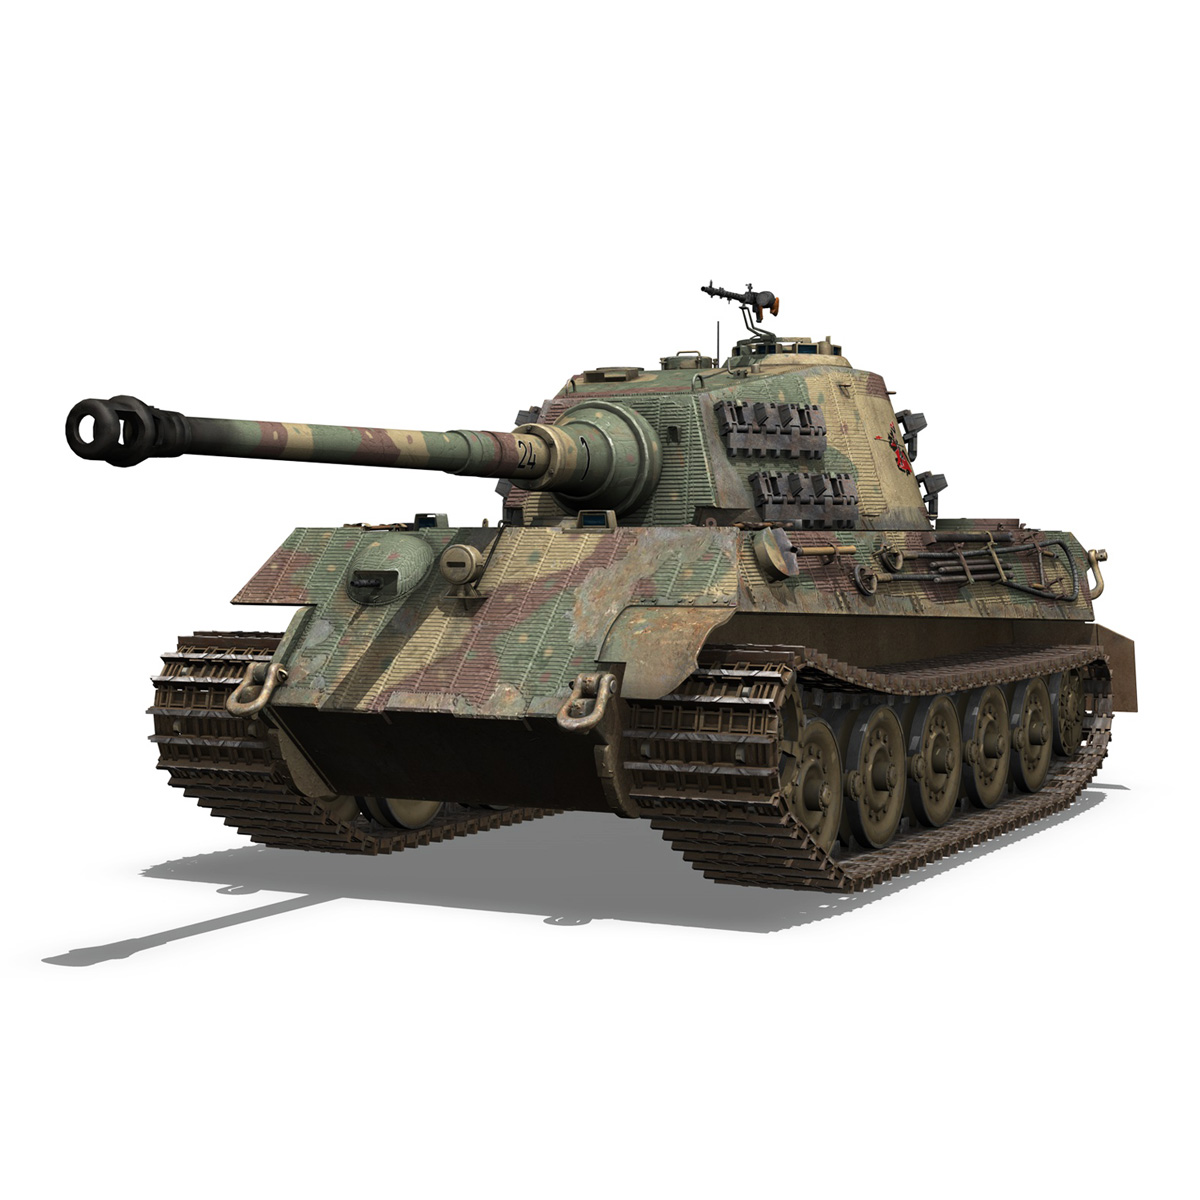 Panzerkampfwagen VI - Ausf B - Tiger II - 124 3d model 3ds c4d lwo lws lw obj 273755